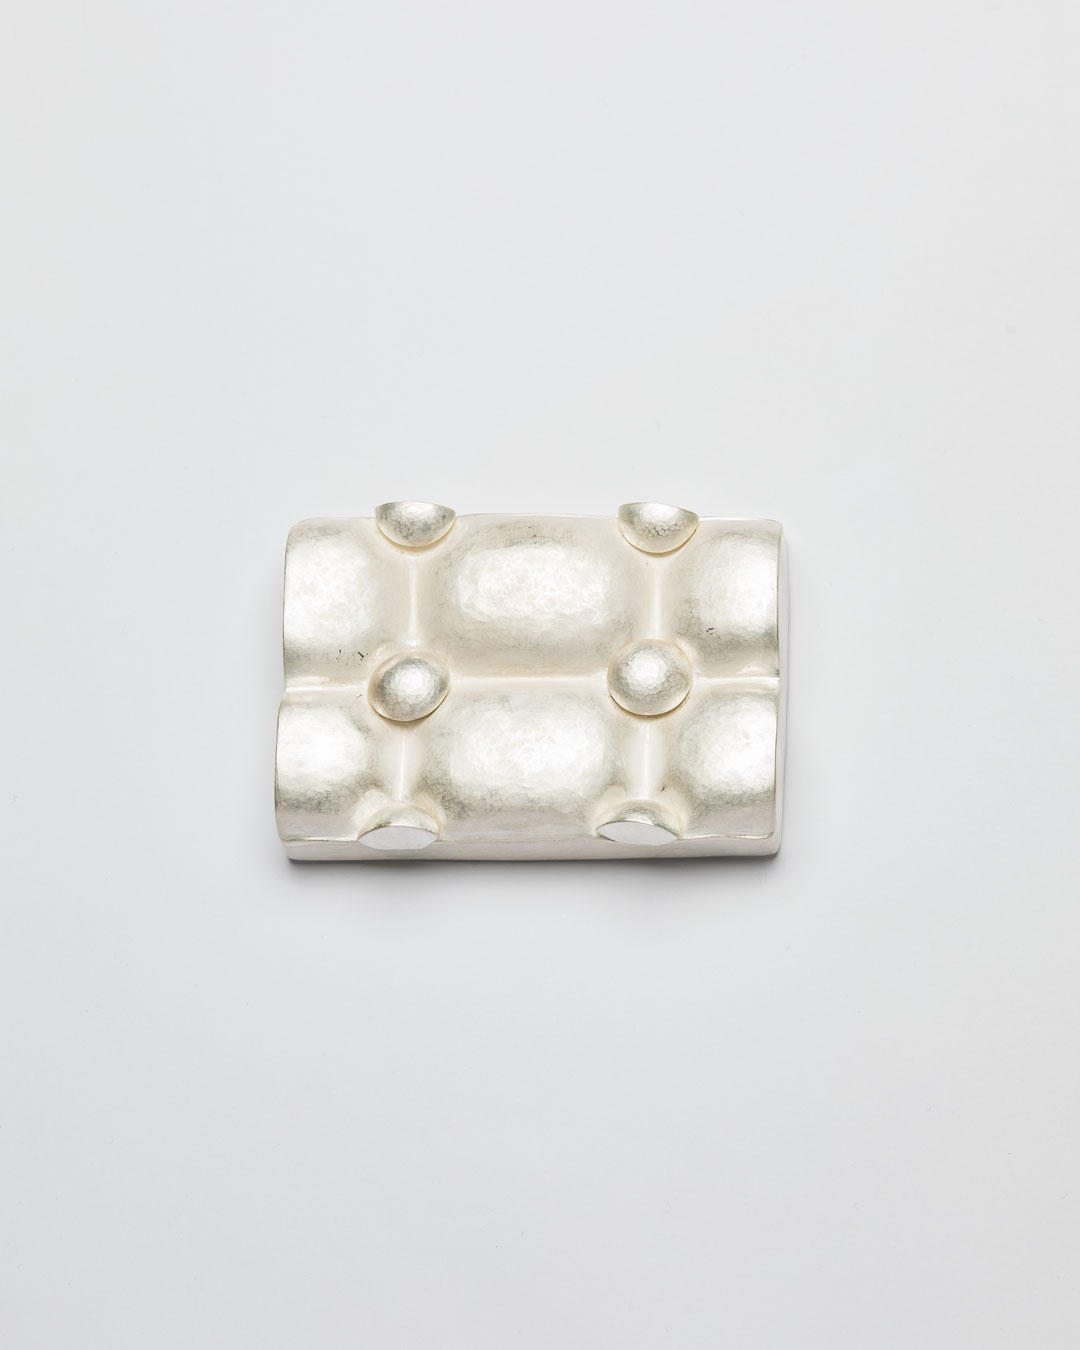 Christine Matthias, untitled, 2017, brooch; silver, 105 x 75 x 25 mm, €5200